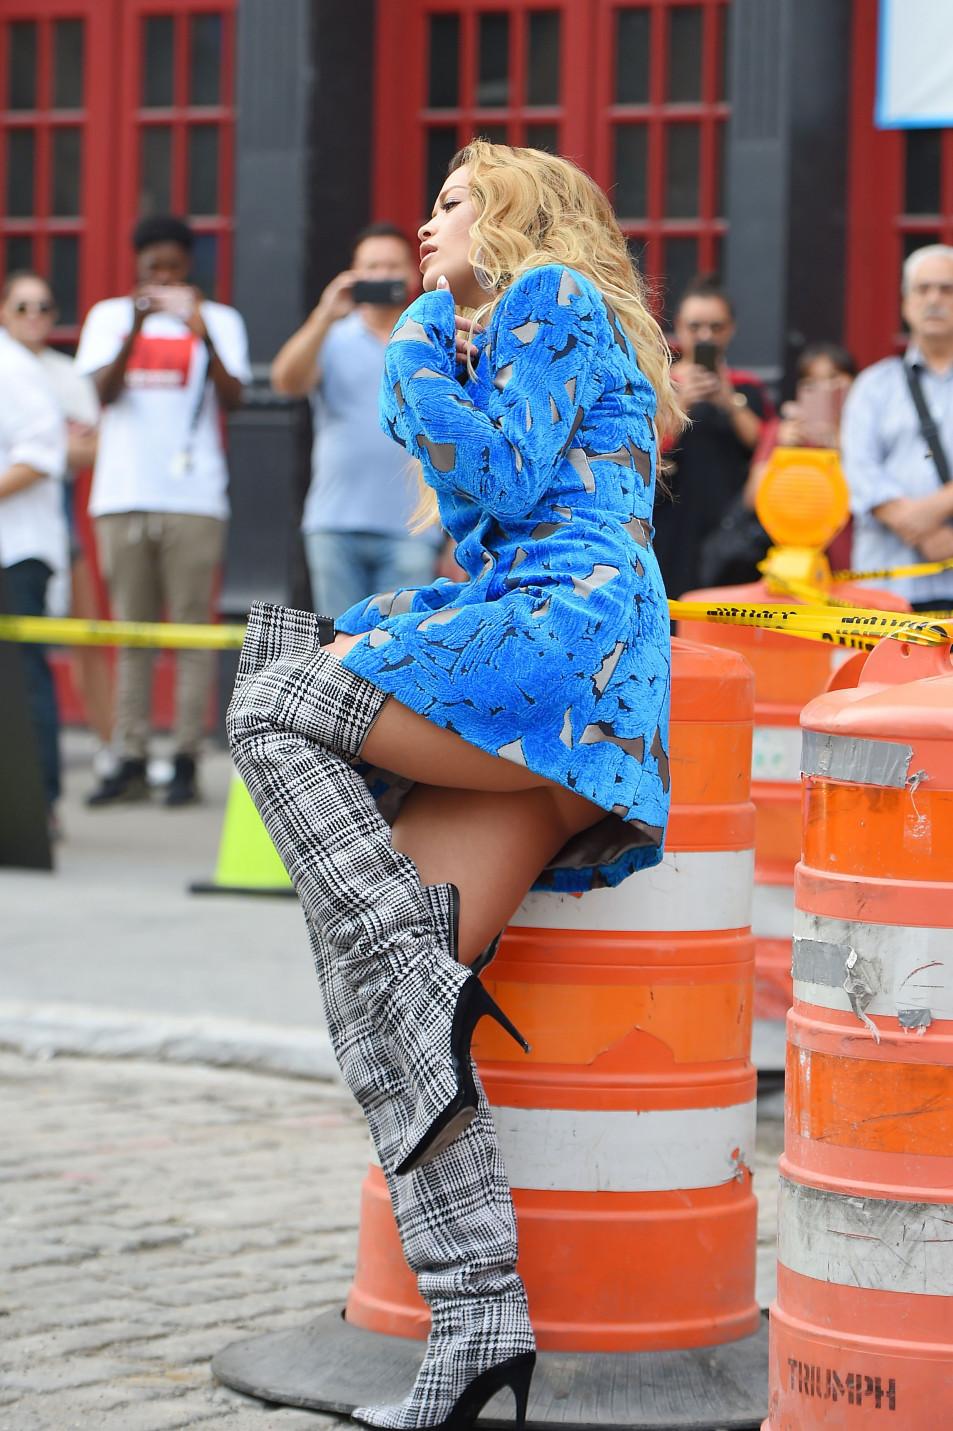 Rita-Ora---upskirt-during-her-video-shoot-in-NYC---10052017-2.jpg